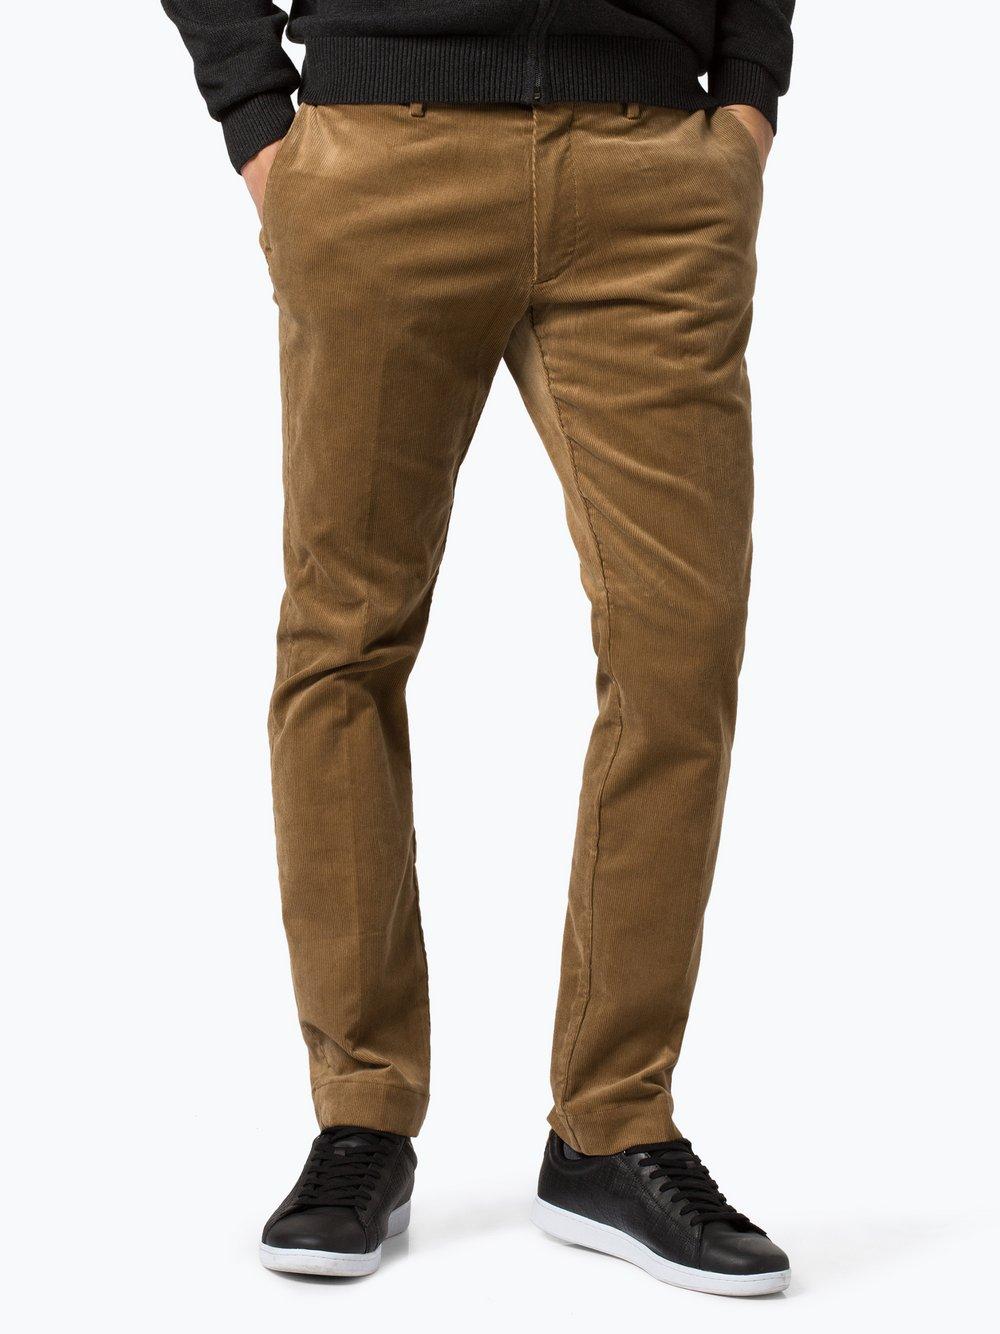 c2c265a37 Polo Ralph Lauren Spodnie męskie kup online | VANGRAAF.COM